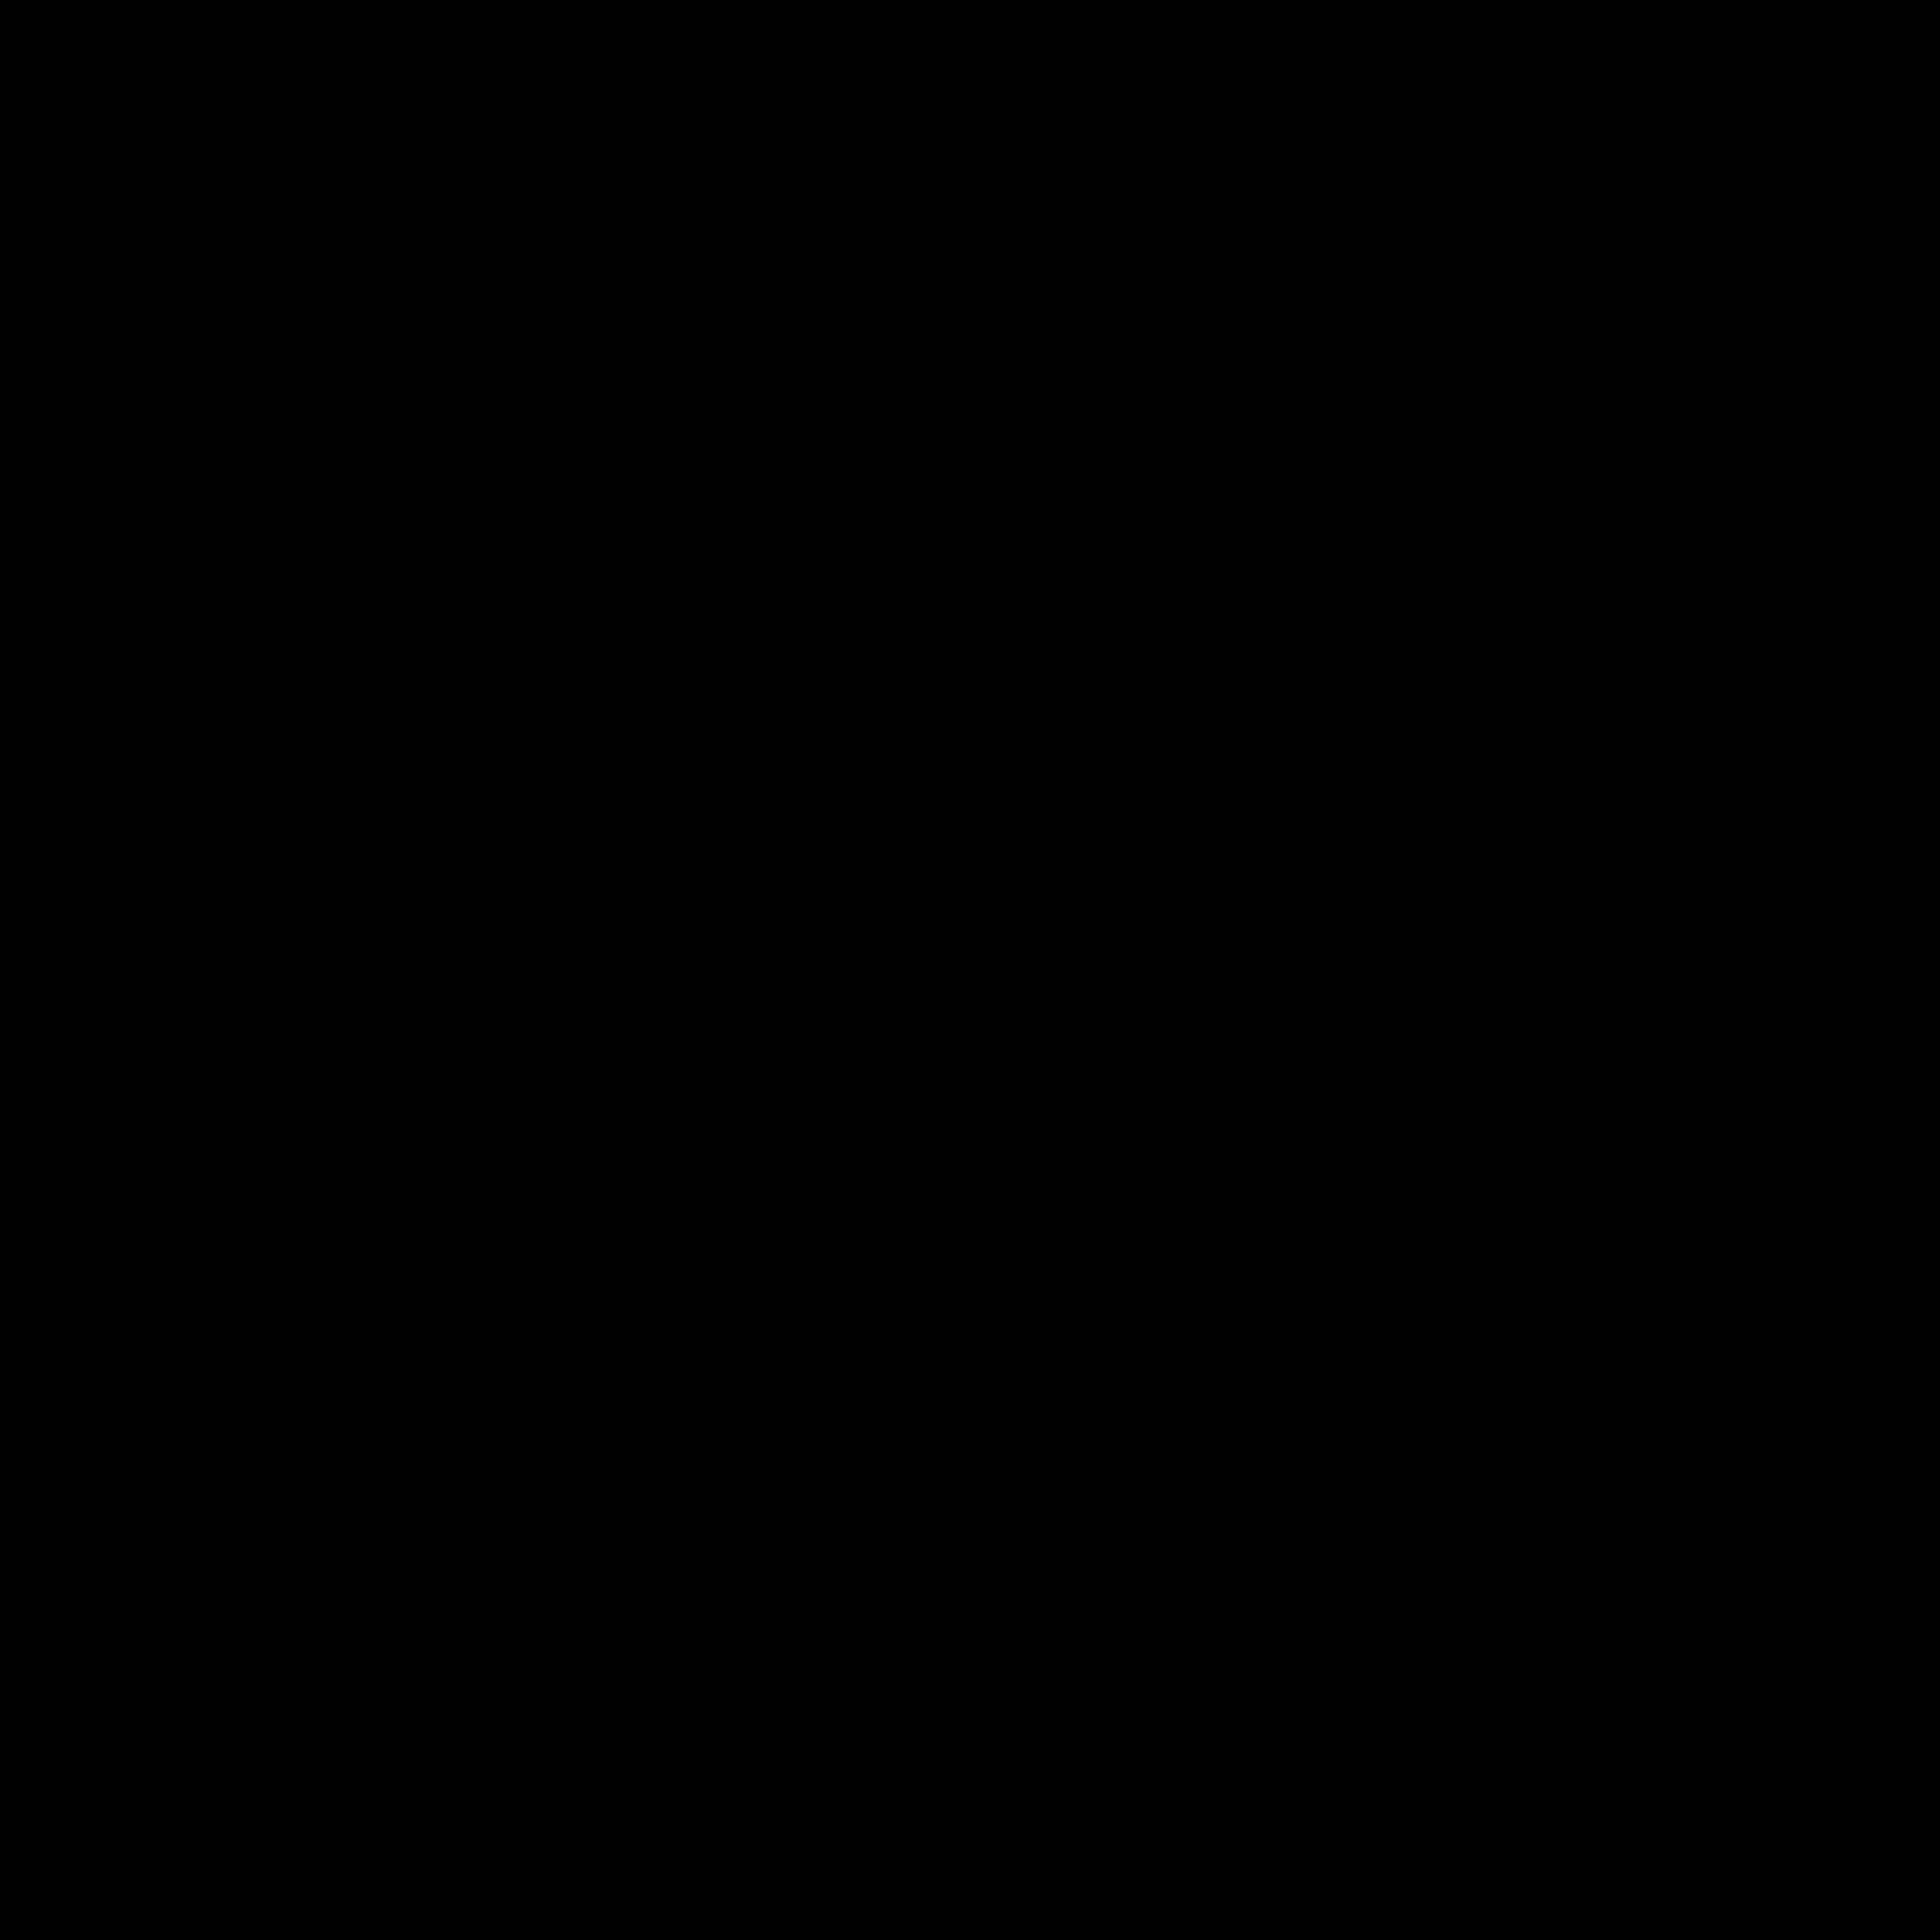 cbs logo 0 - CBS Logo